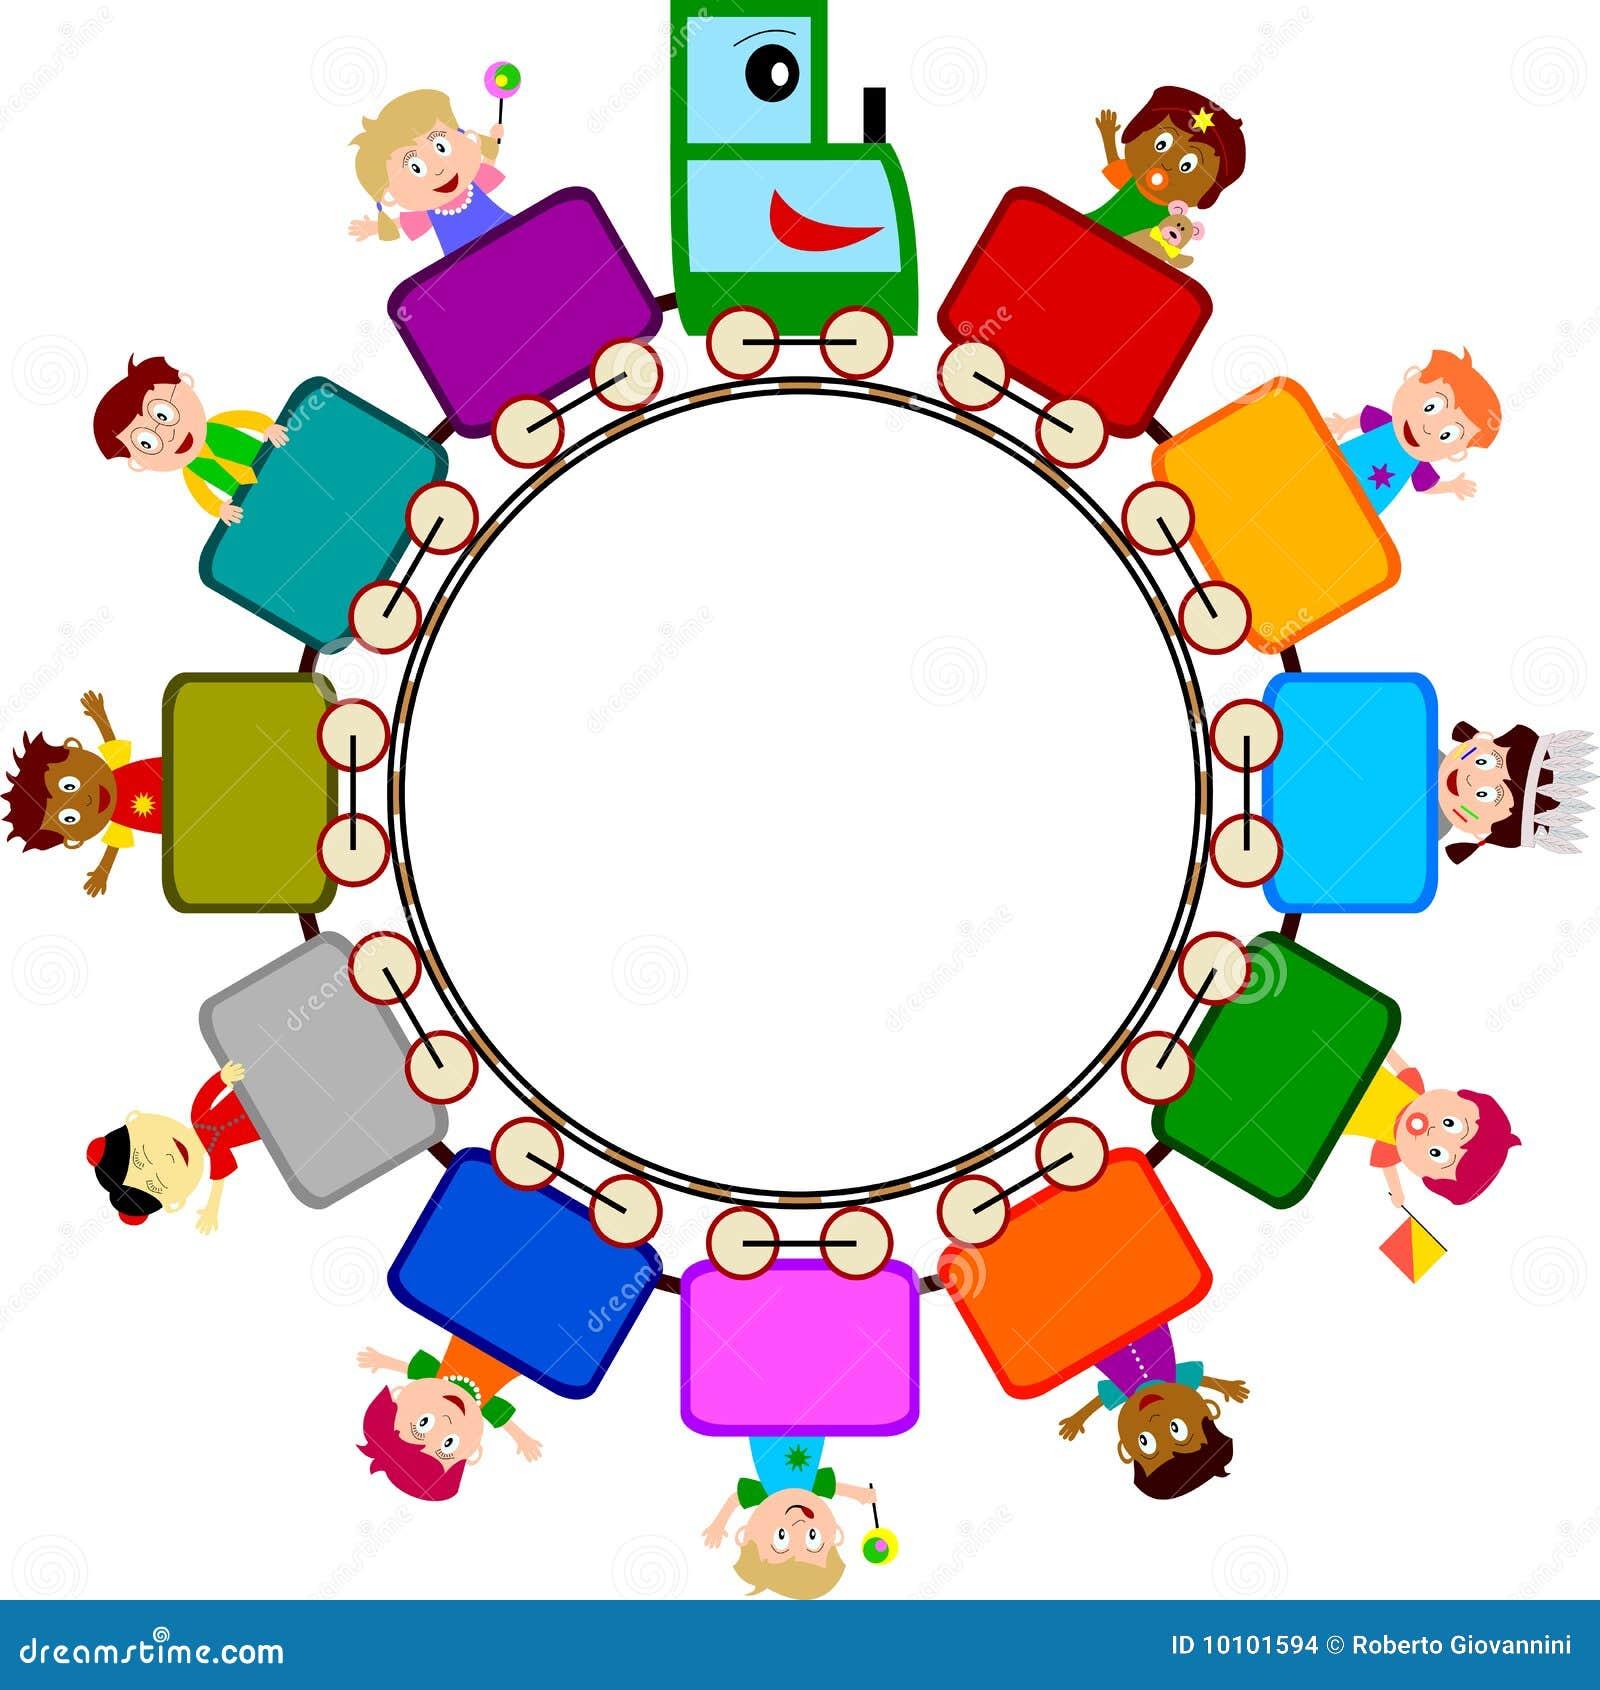 Kids On Train Logo Stock Images - Image: 10101594